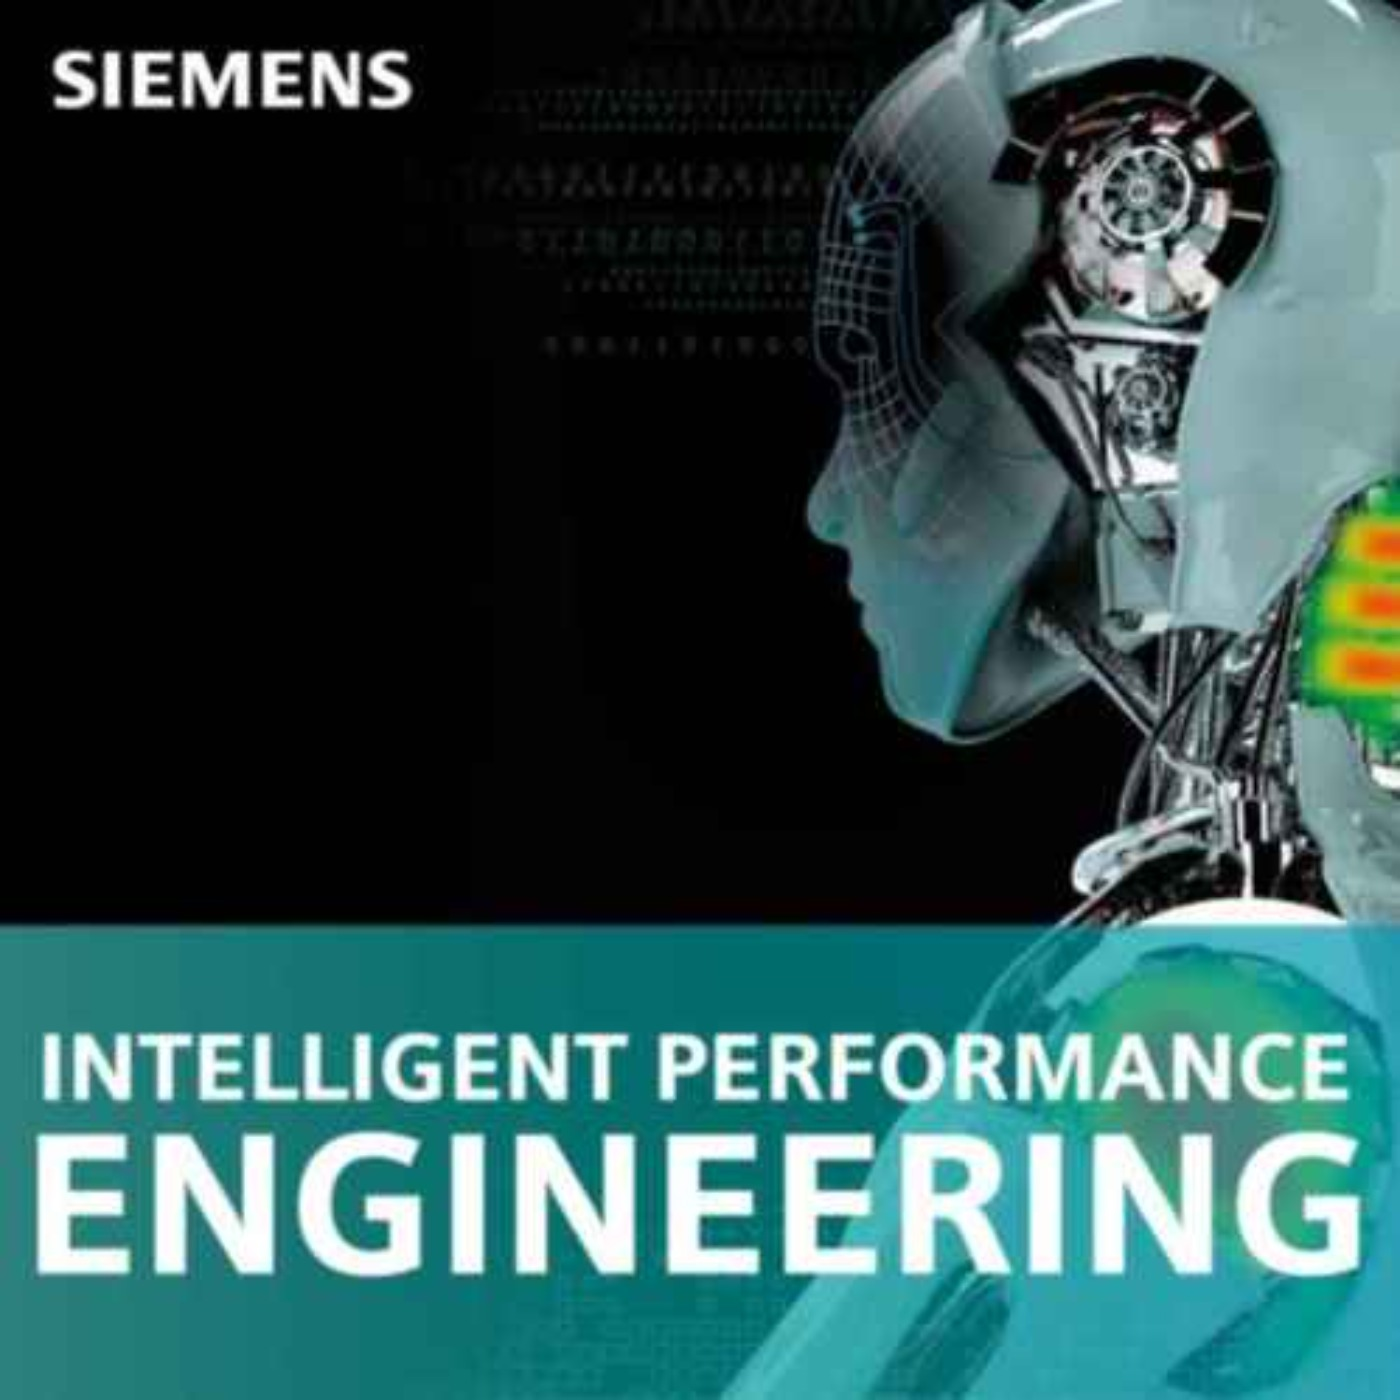 The Digital Revolution: How Intelligent Performance Engineering Provides Closed-loop Validation